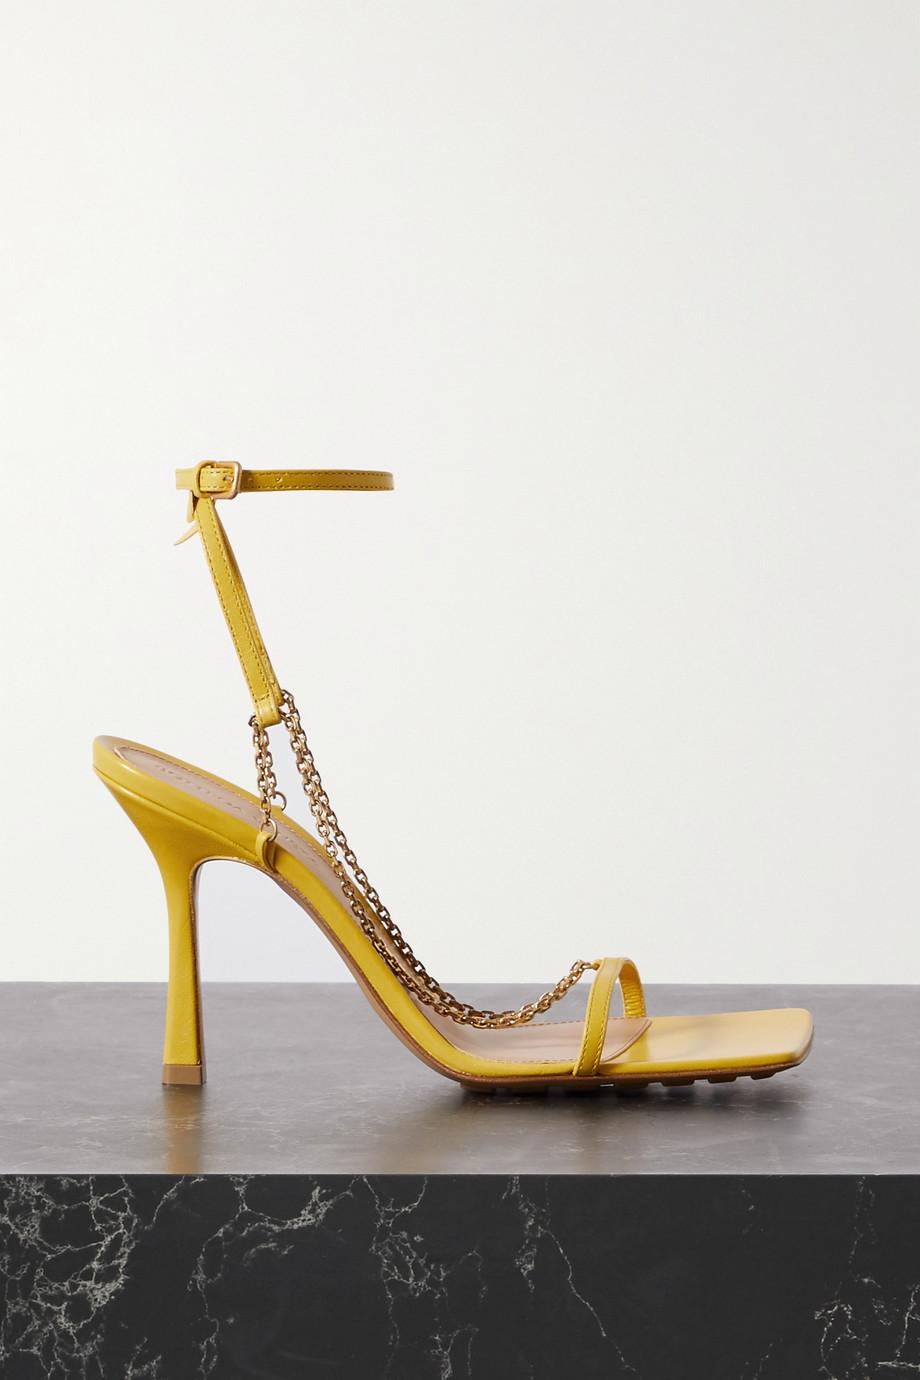 Bottega Veneta Sandalen aus Leder mit Kette